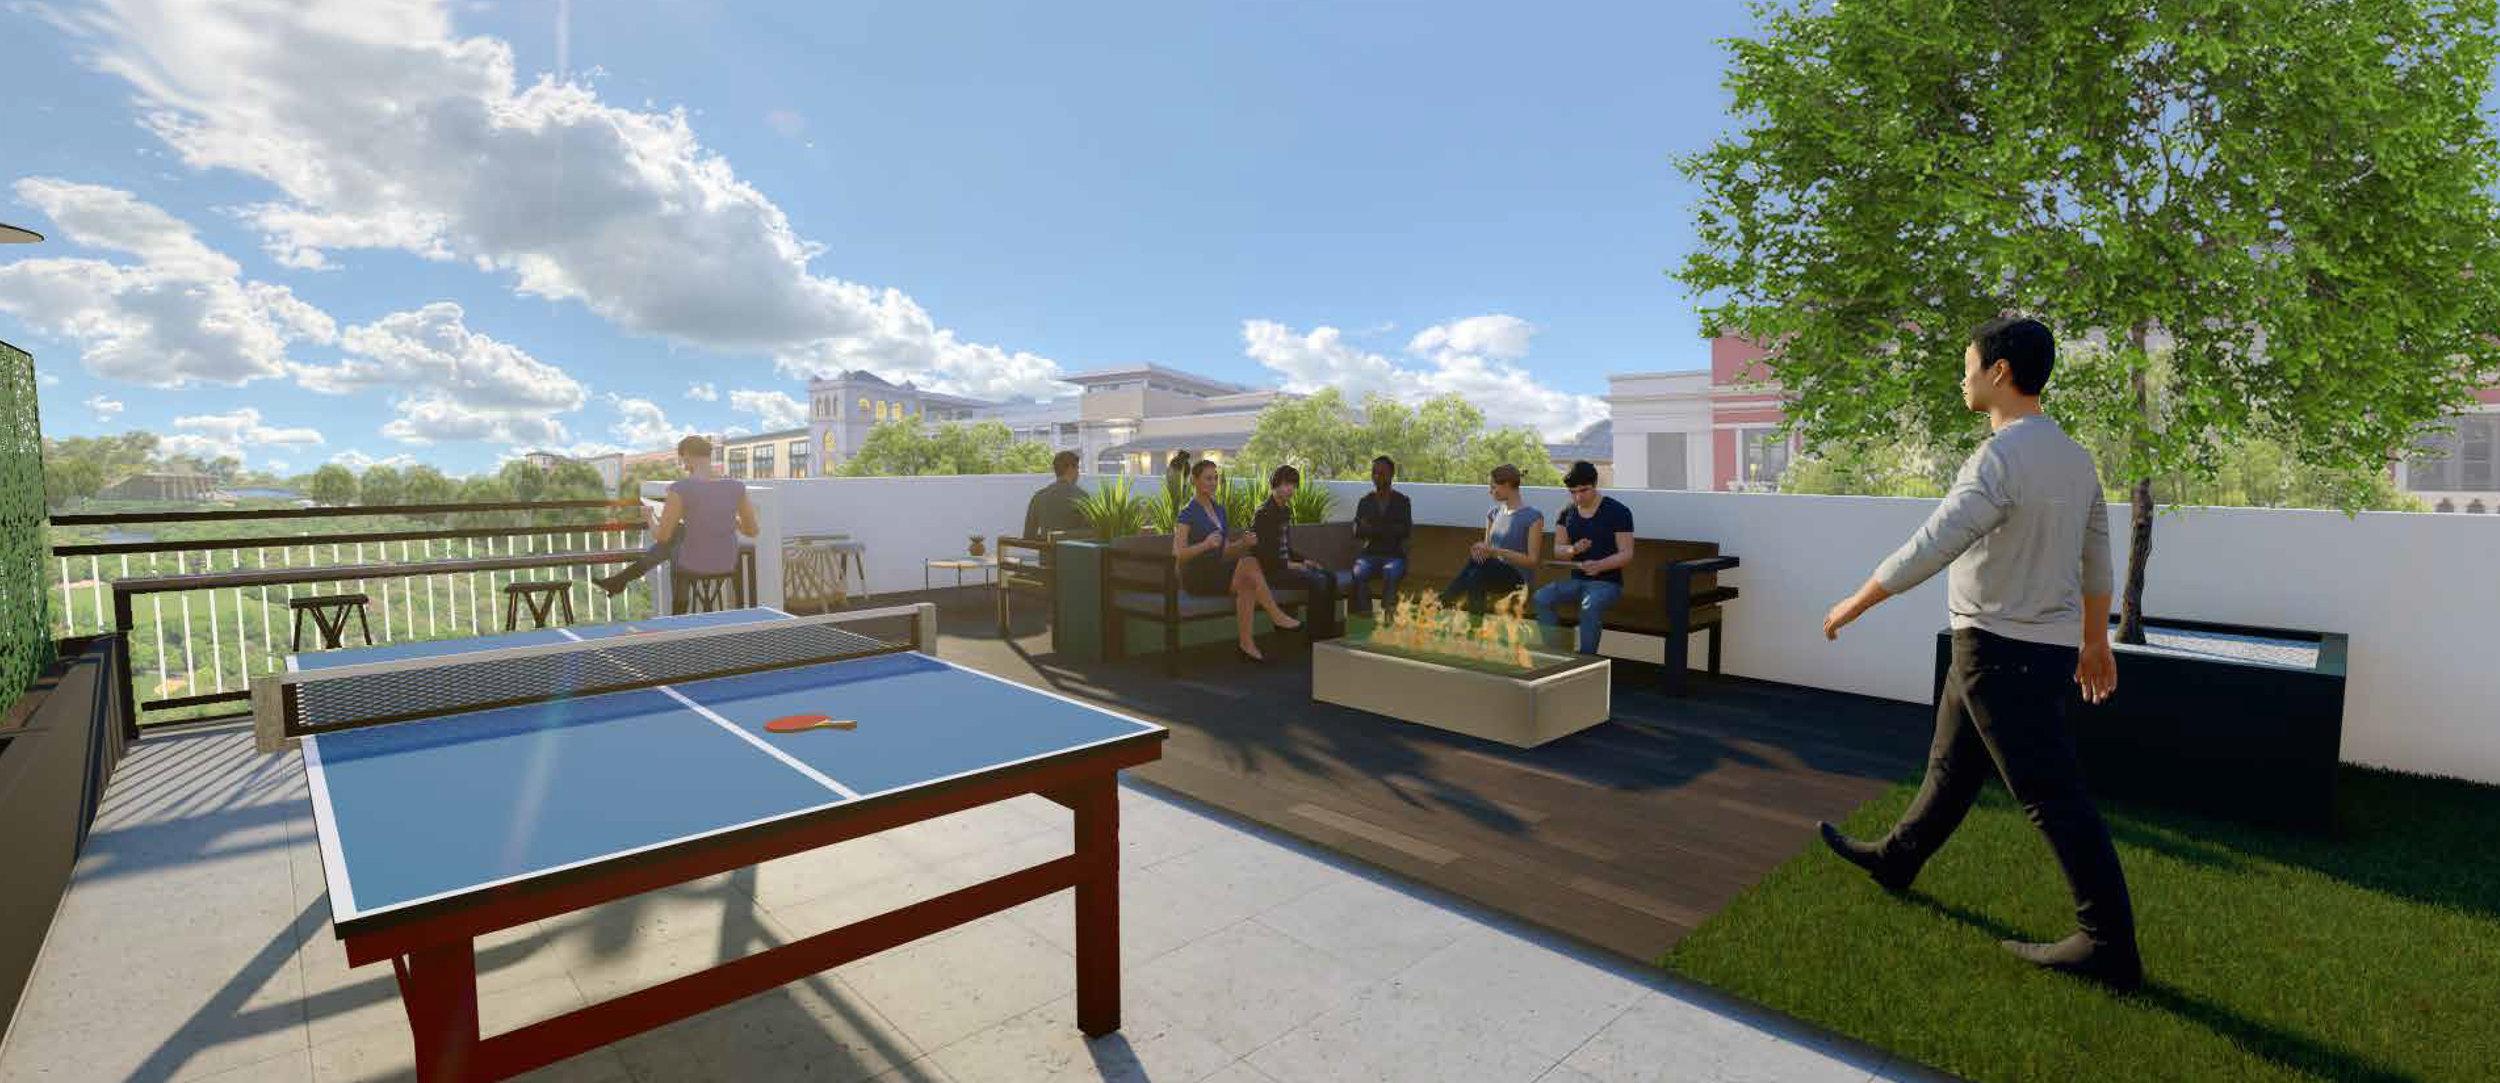 Roof Terrace   Firepit Lounge